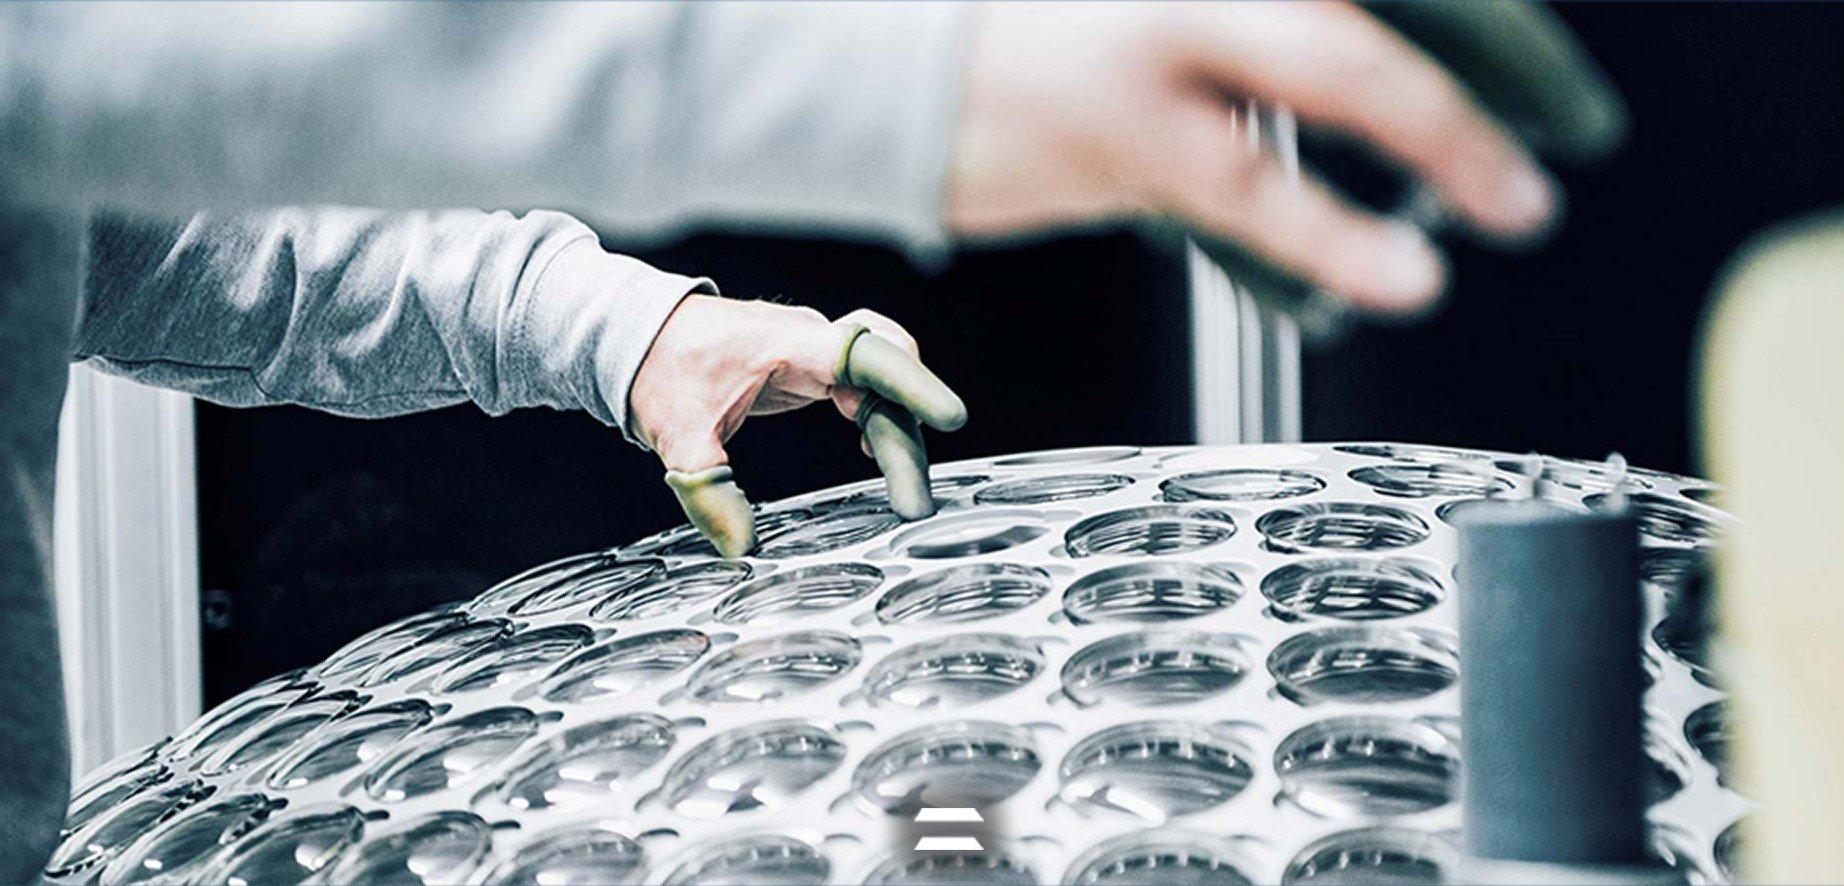 LTL Ophtalmic Lenses production planning - CyberPlan Cybertec